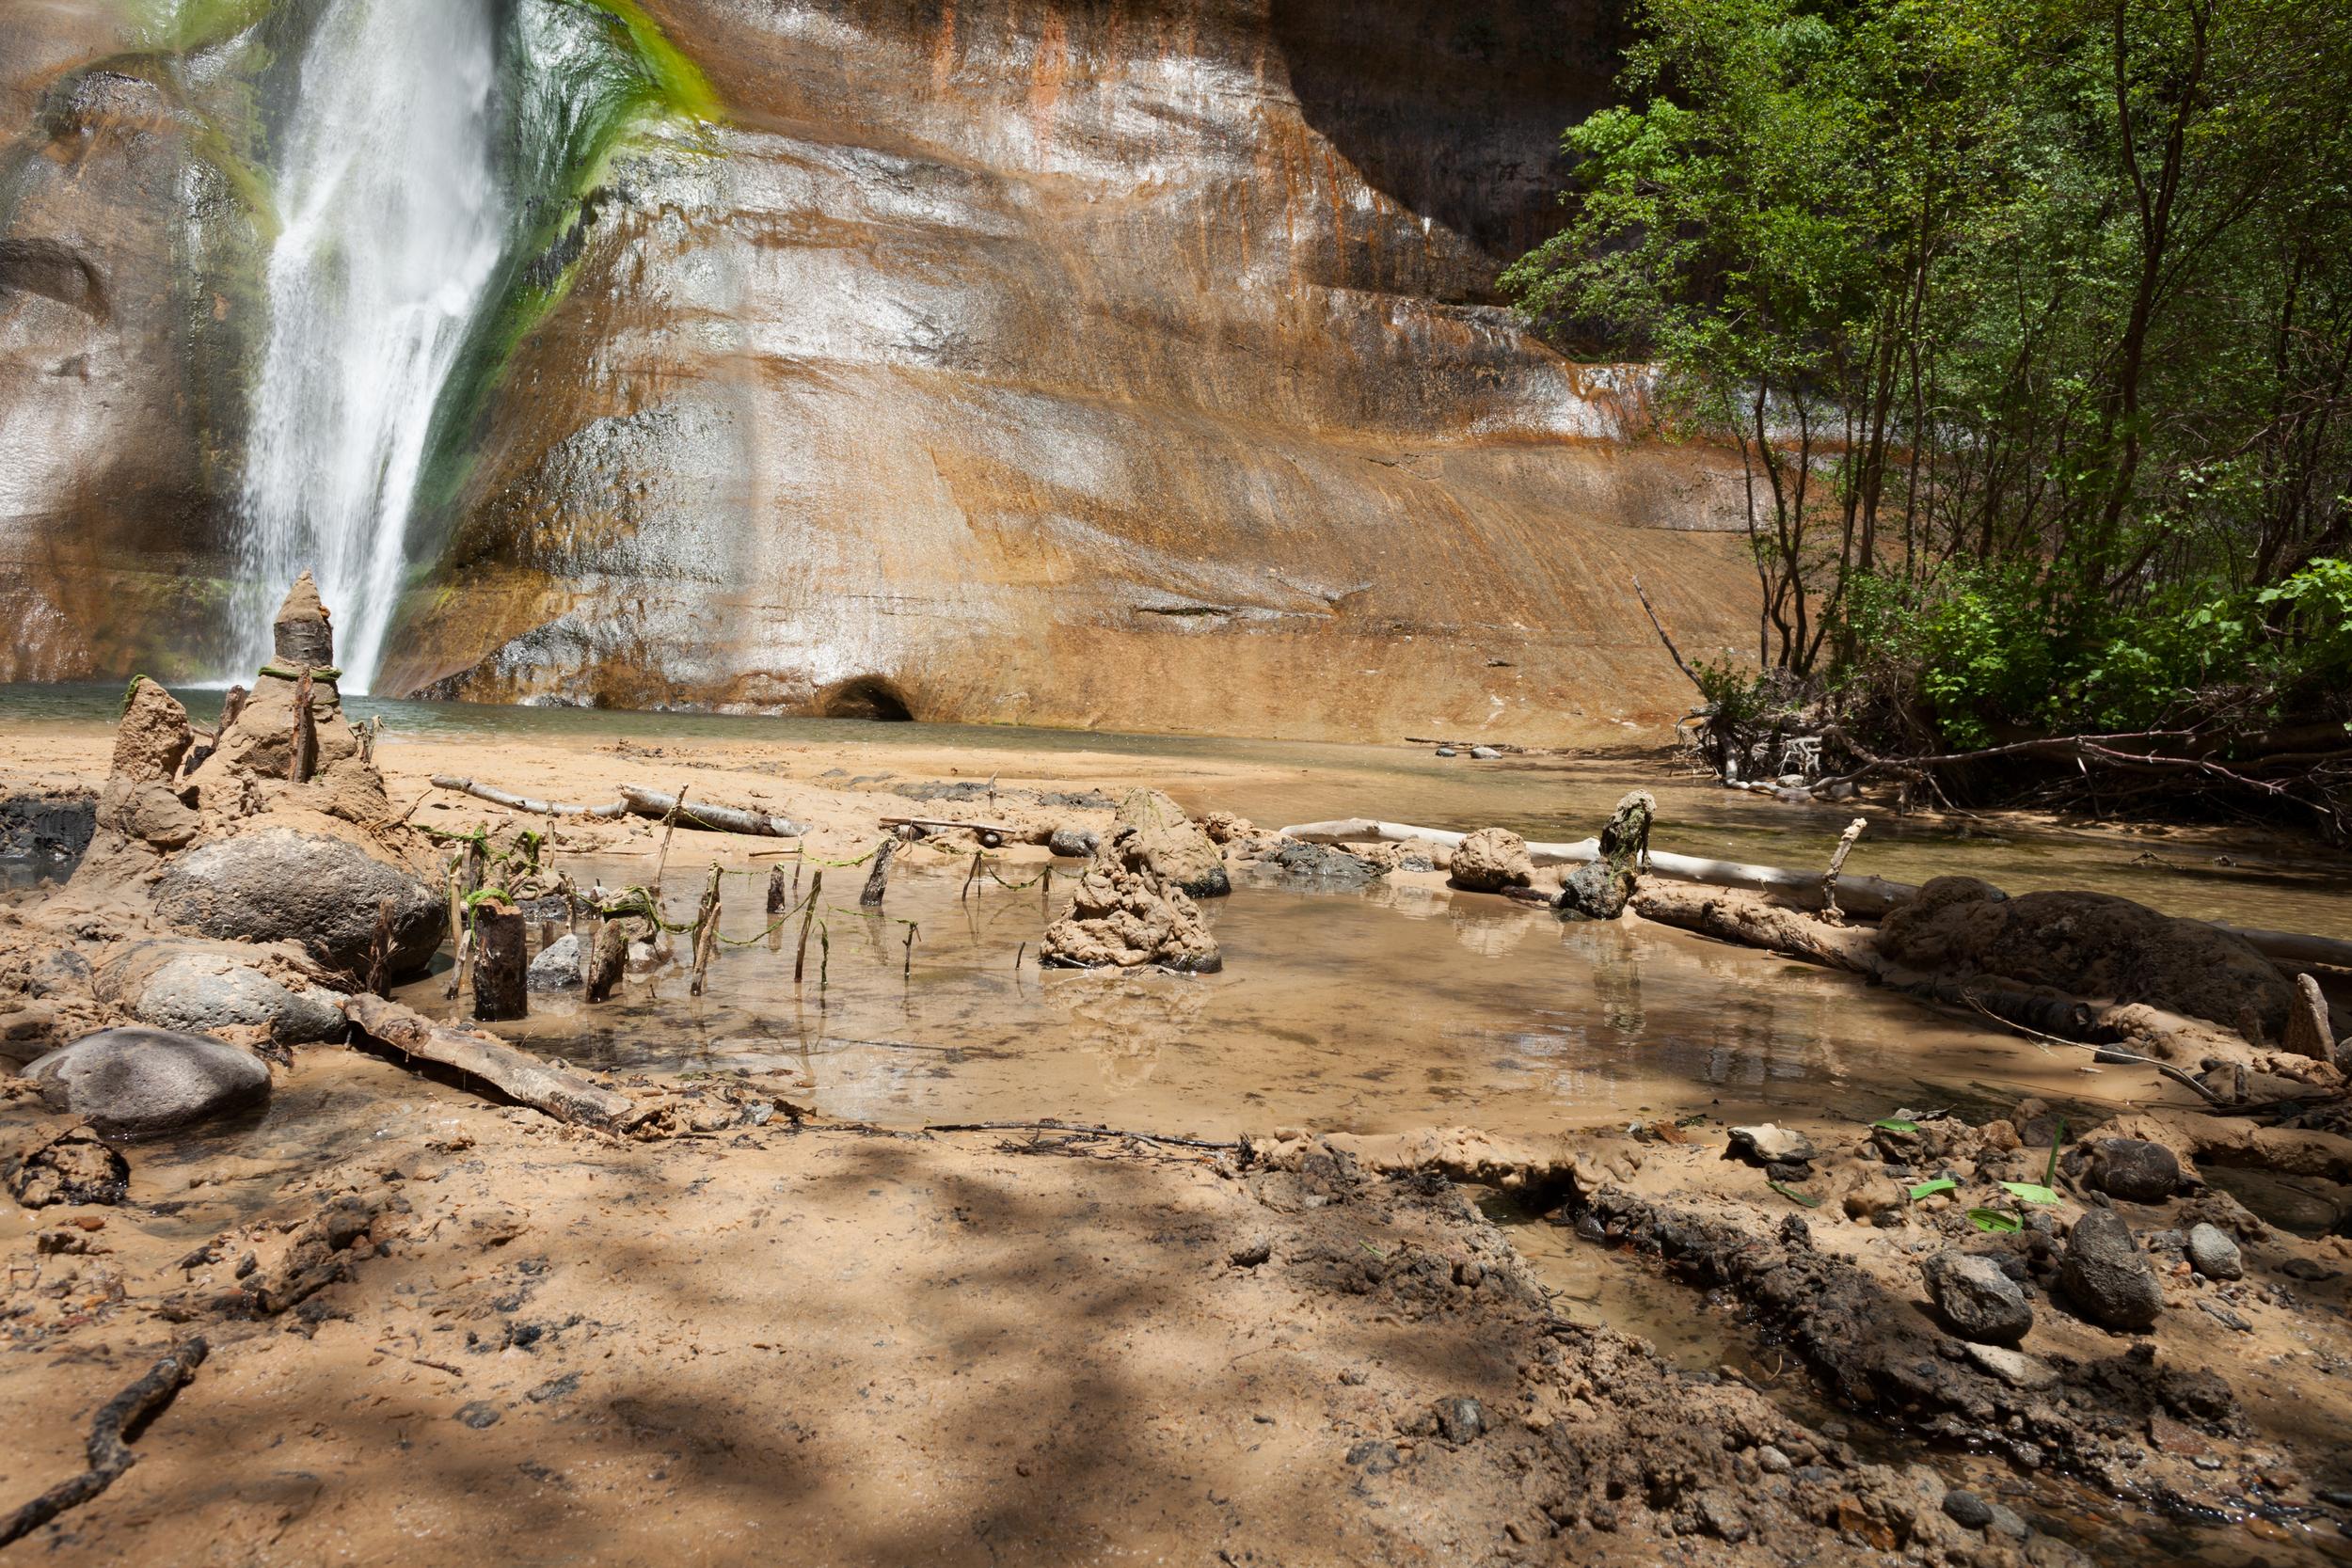 Lower Calf Creek Falls Restoration Project